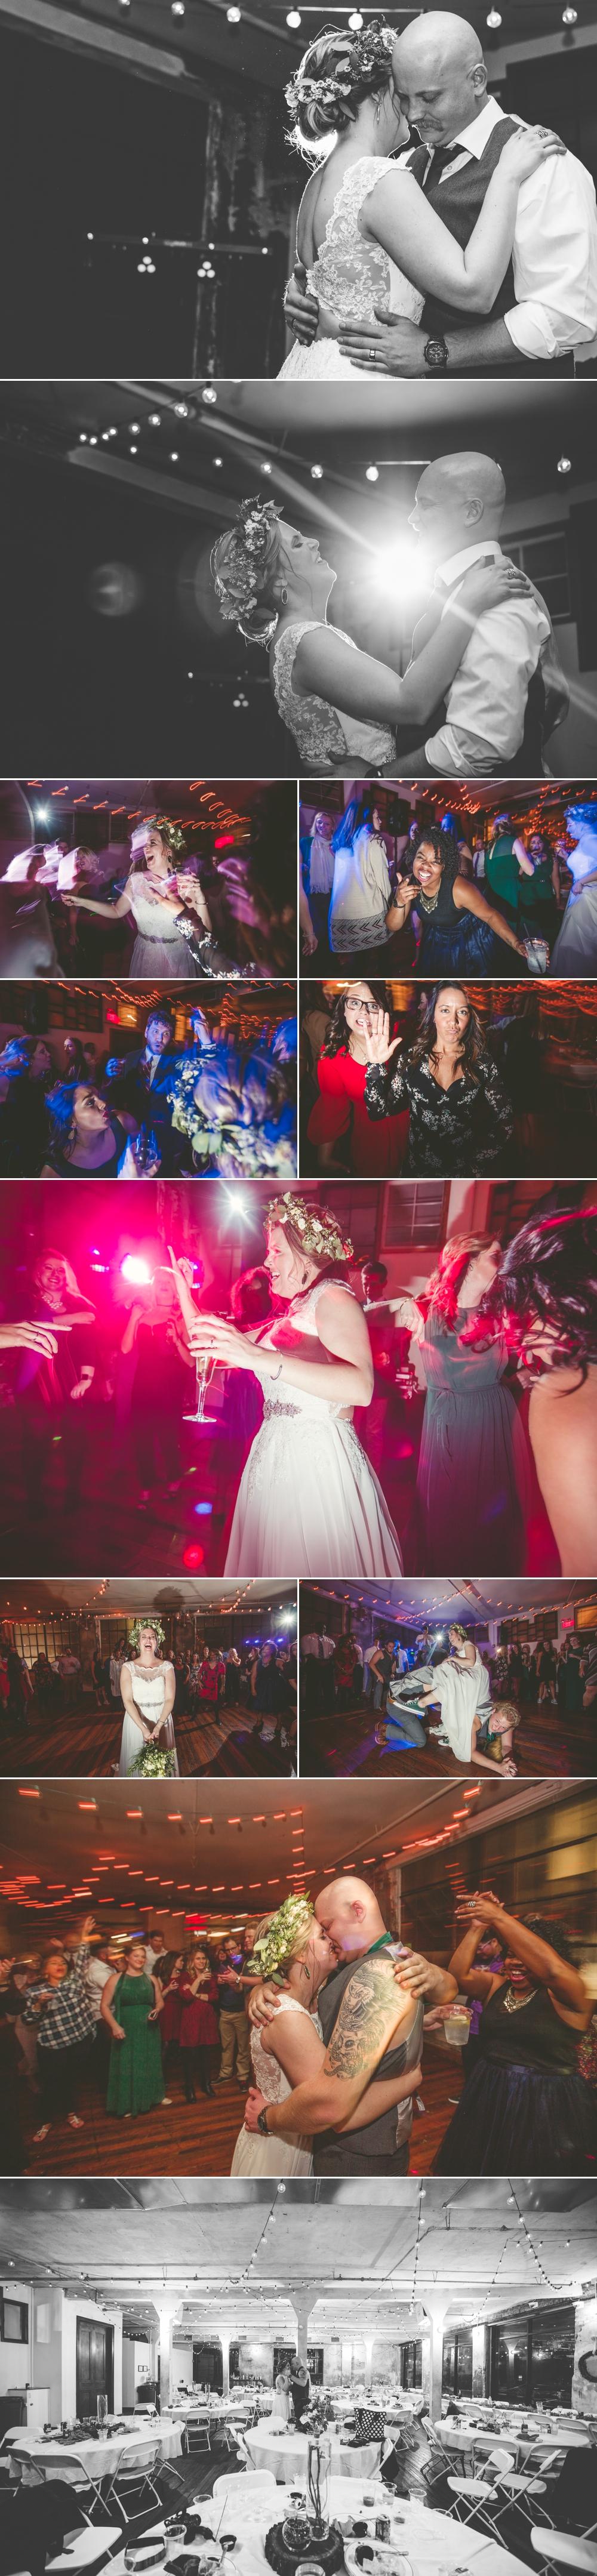 jason_domingues_photography_best_kansas_city_wedding_photographer_kc_weddings_the_bauer0003